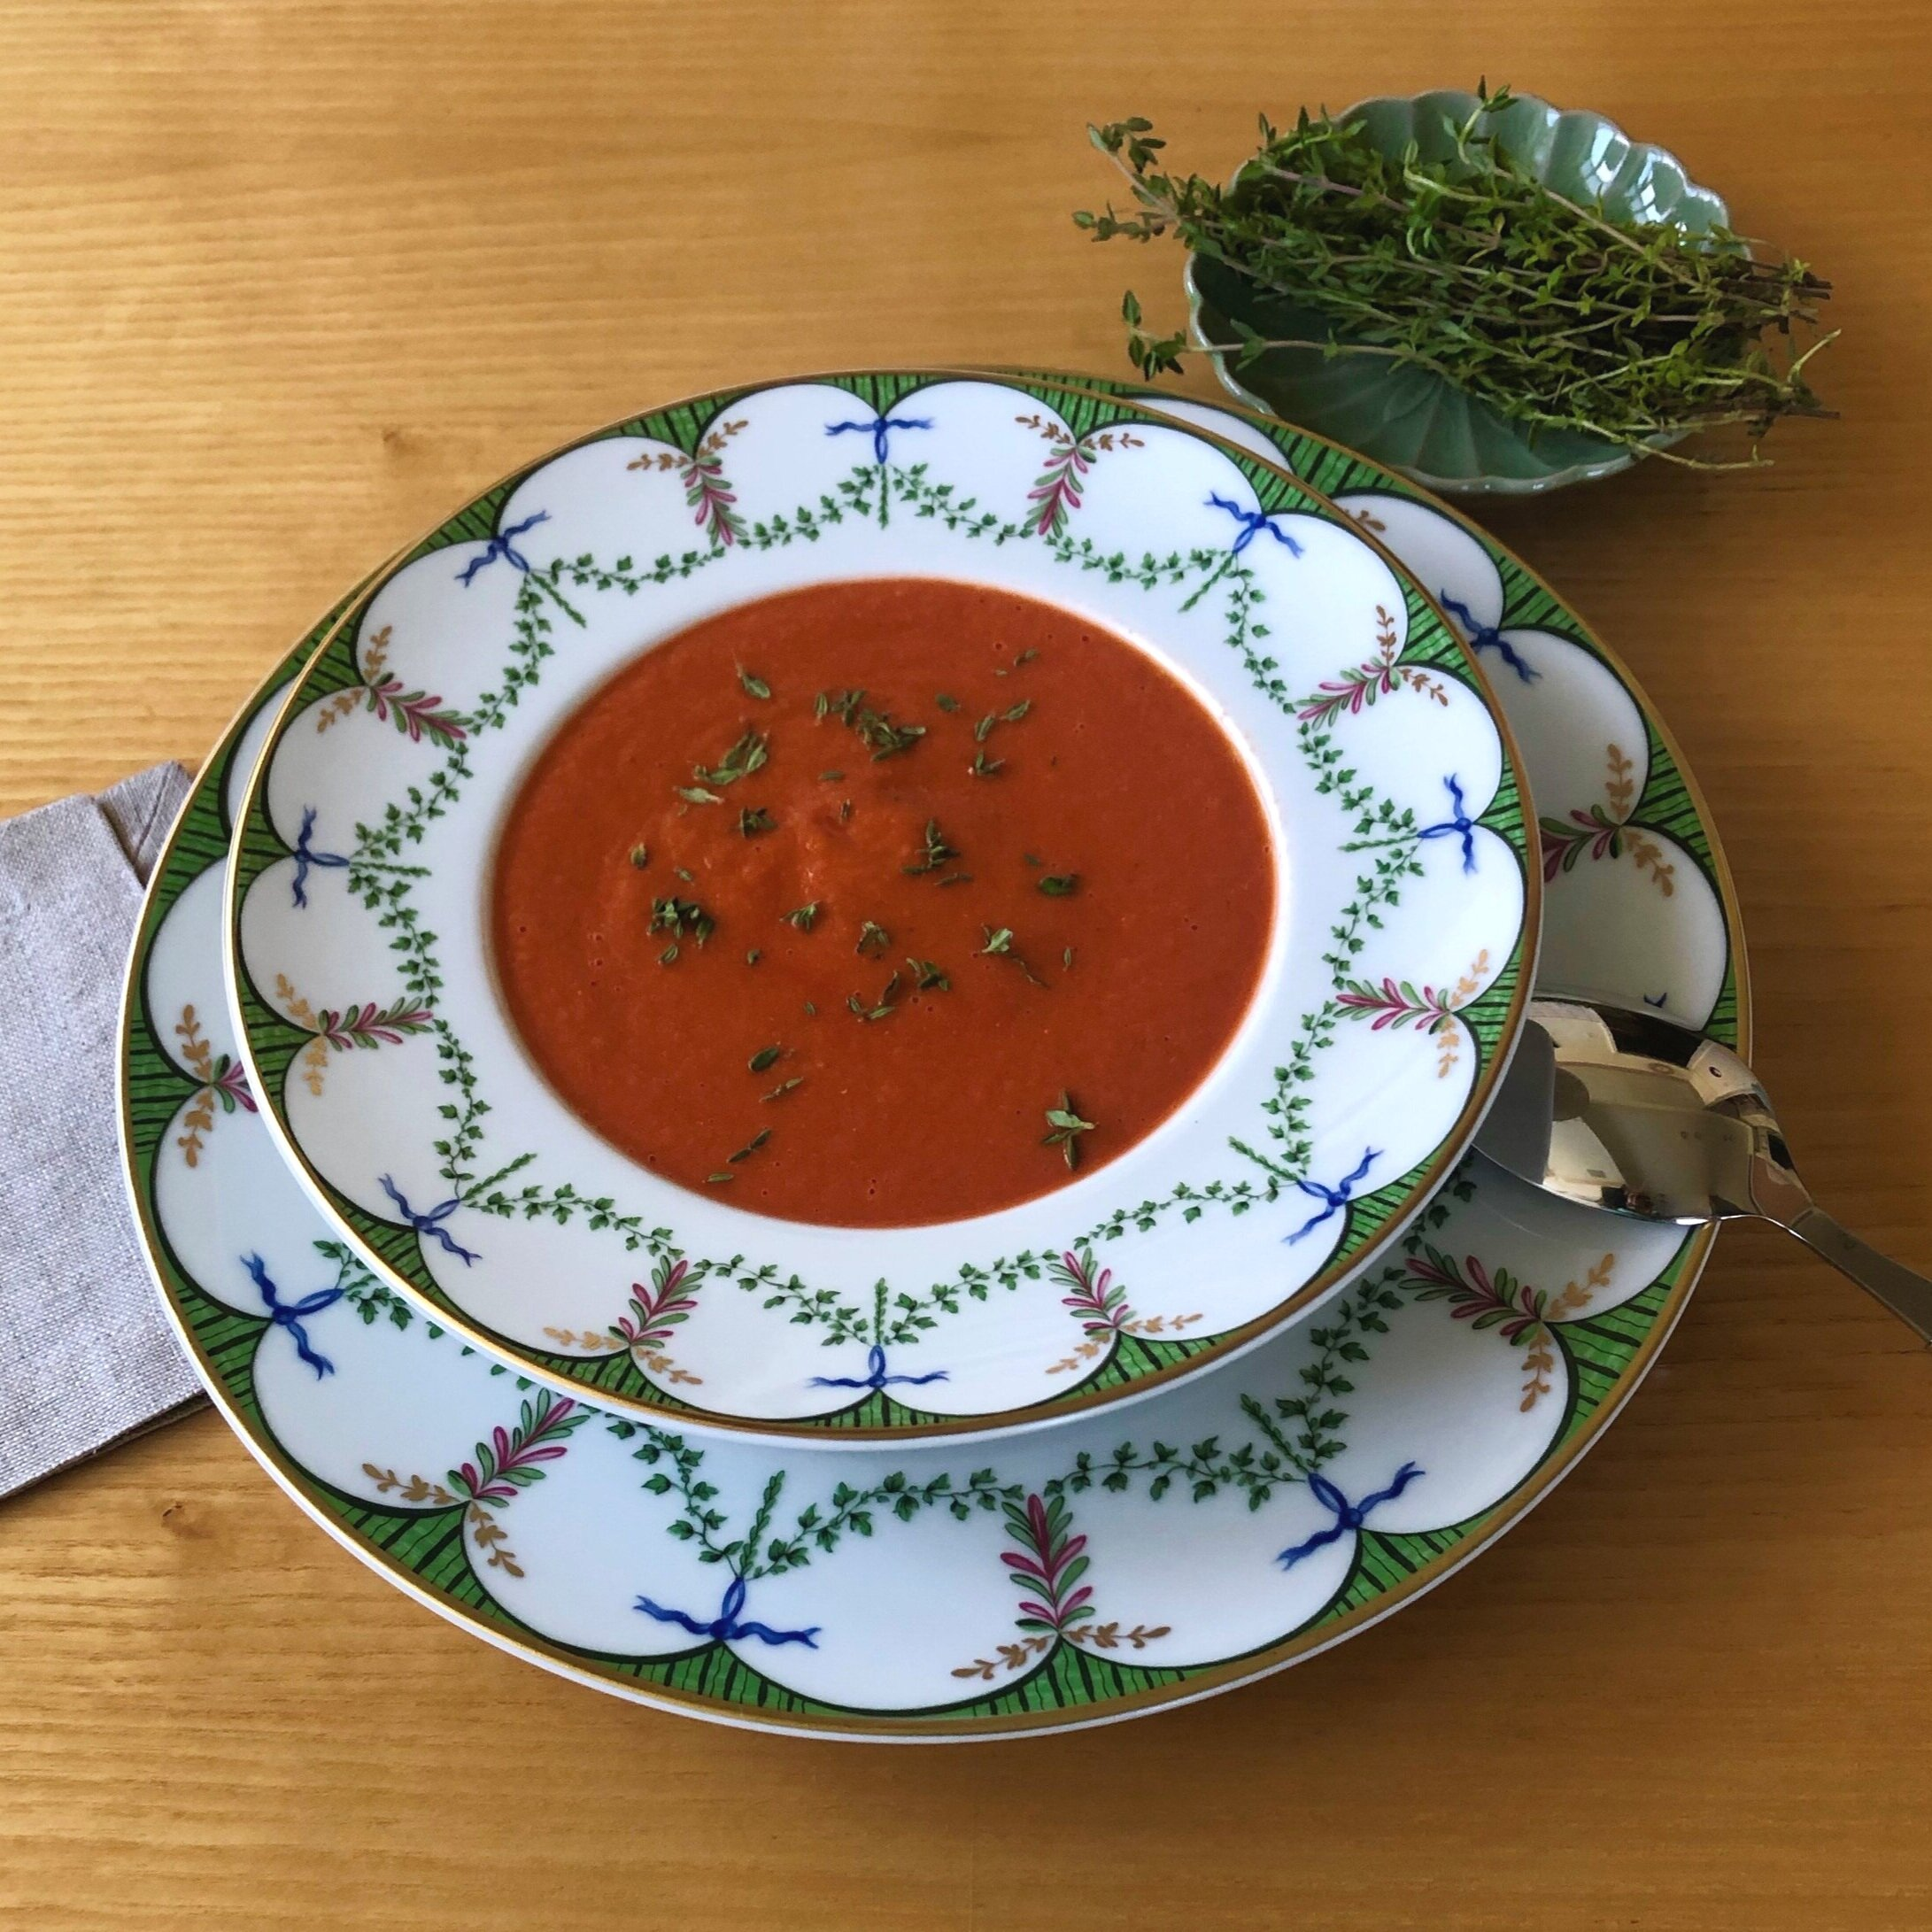 Creamy+Roasted+Tomato+Soup.jpg